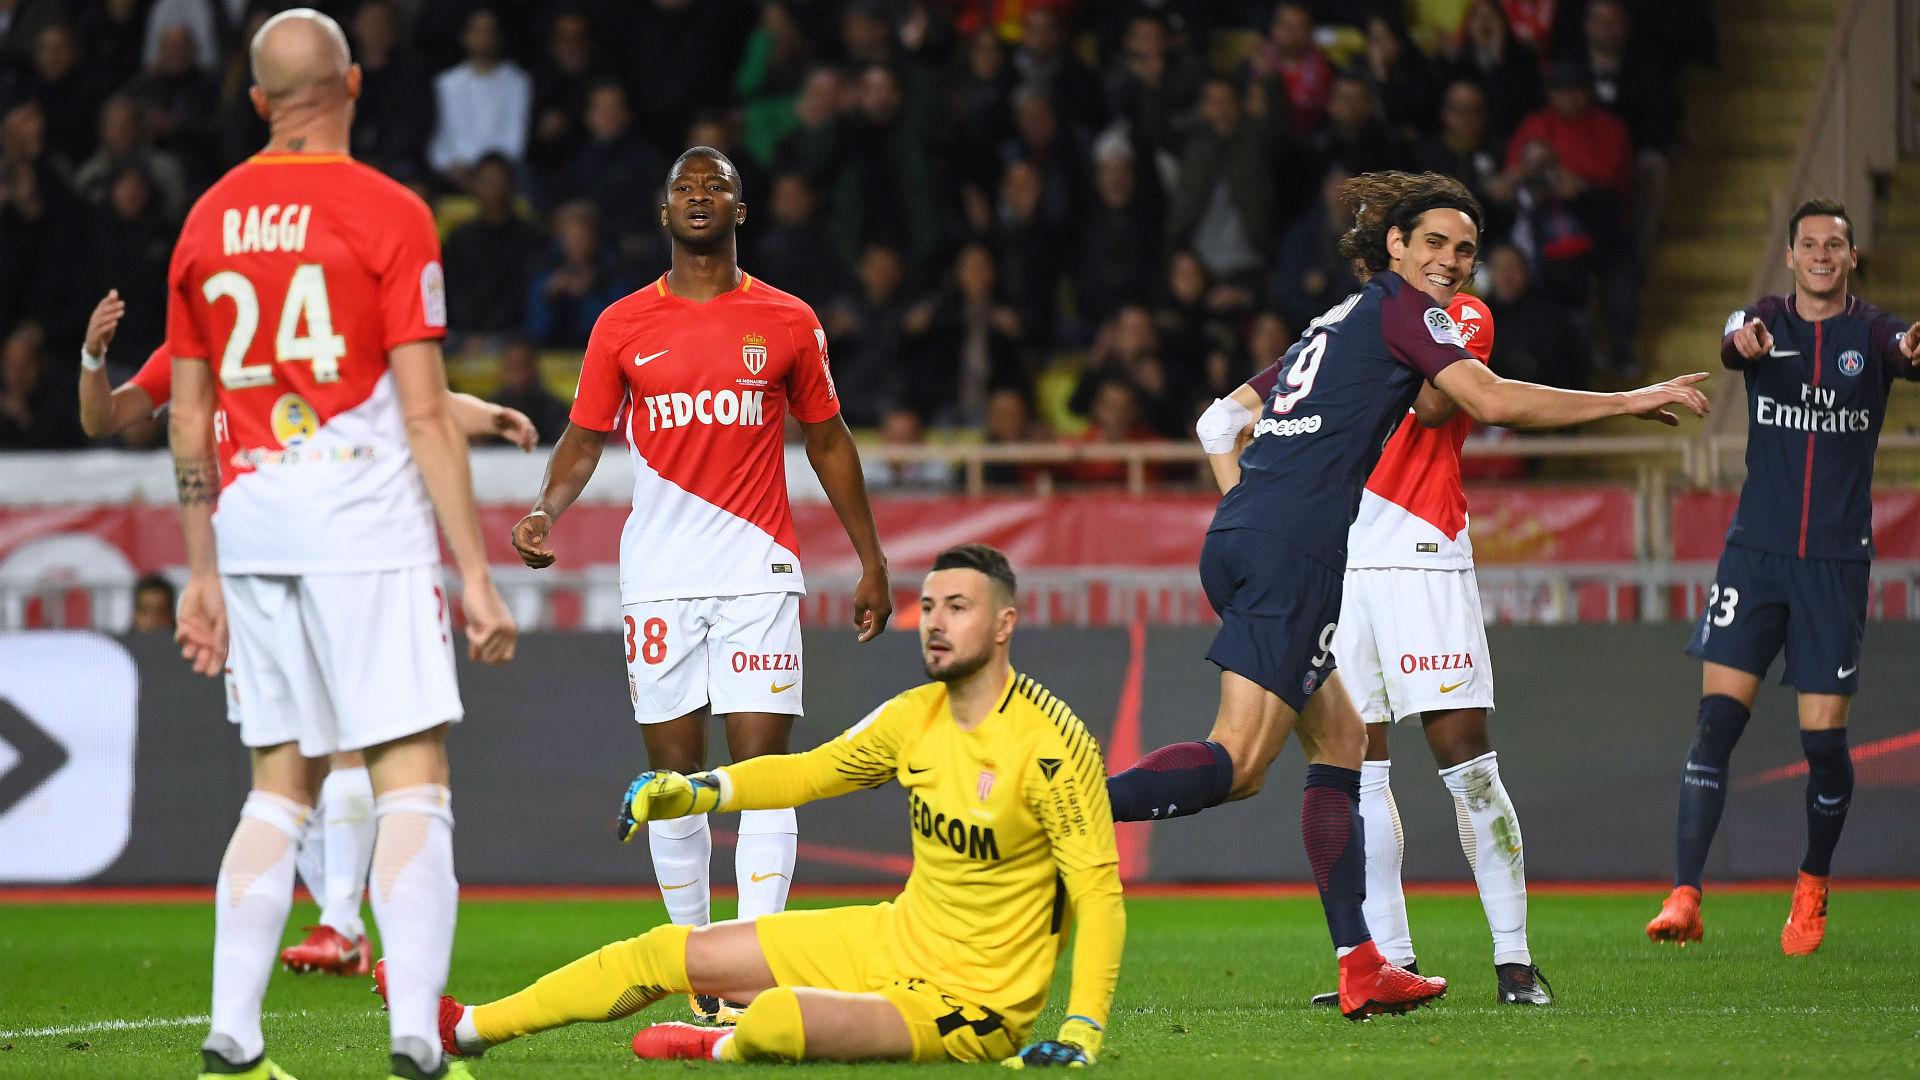 Psg Gegen As Monaco Der Ligue1 Gipfel Im Live Stream